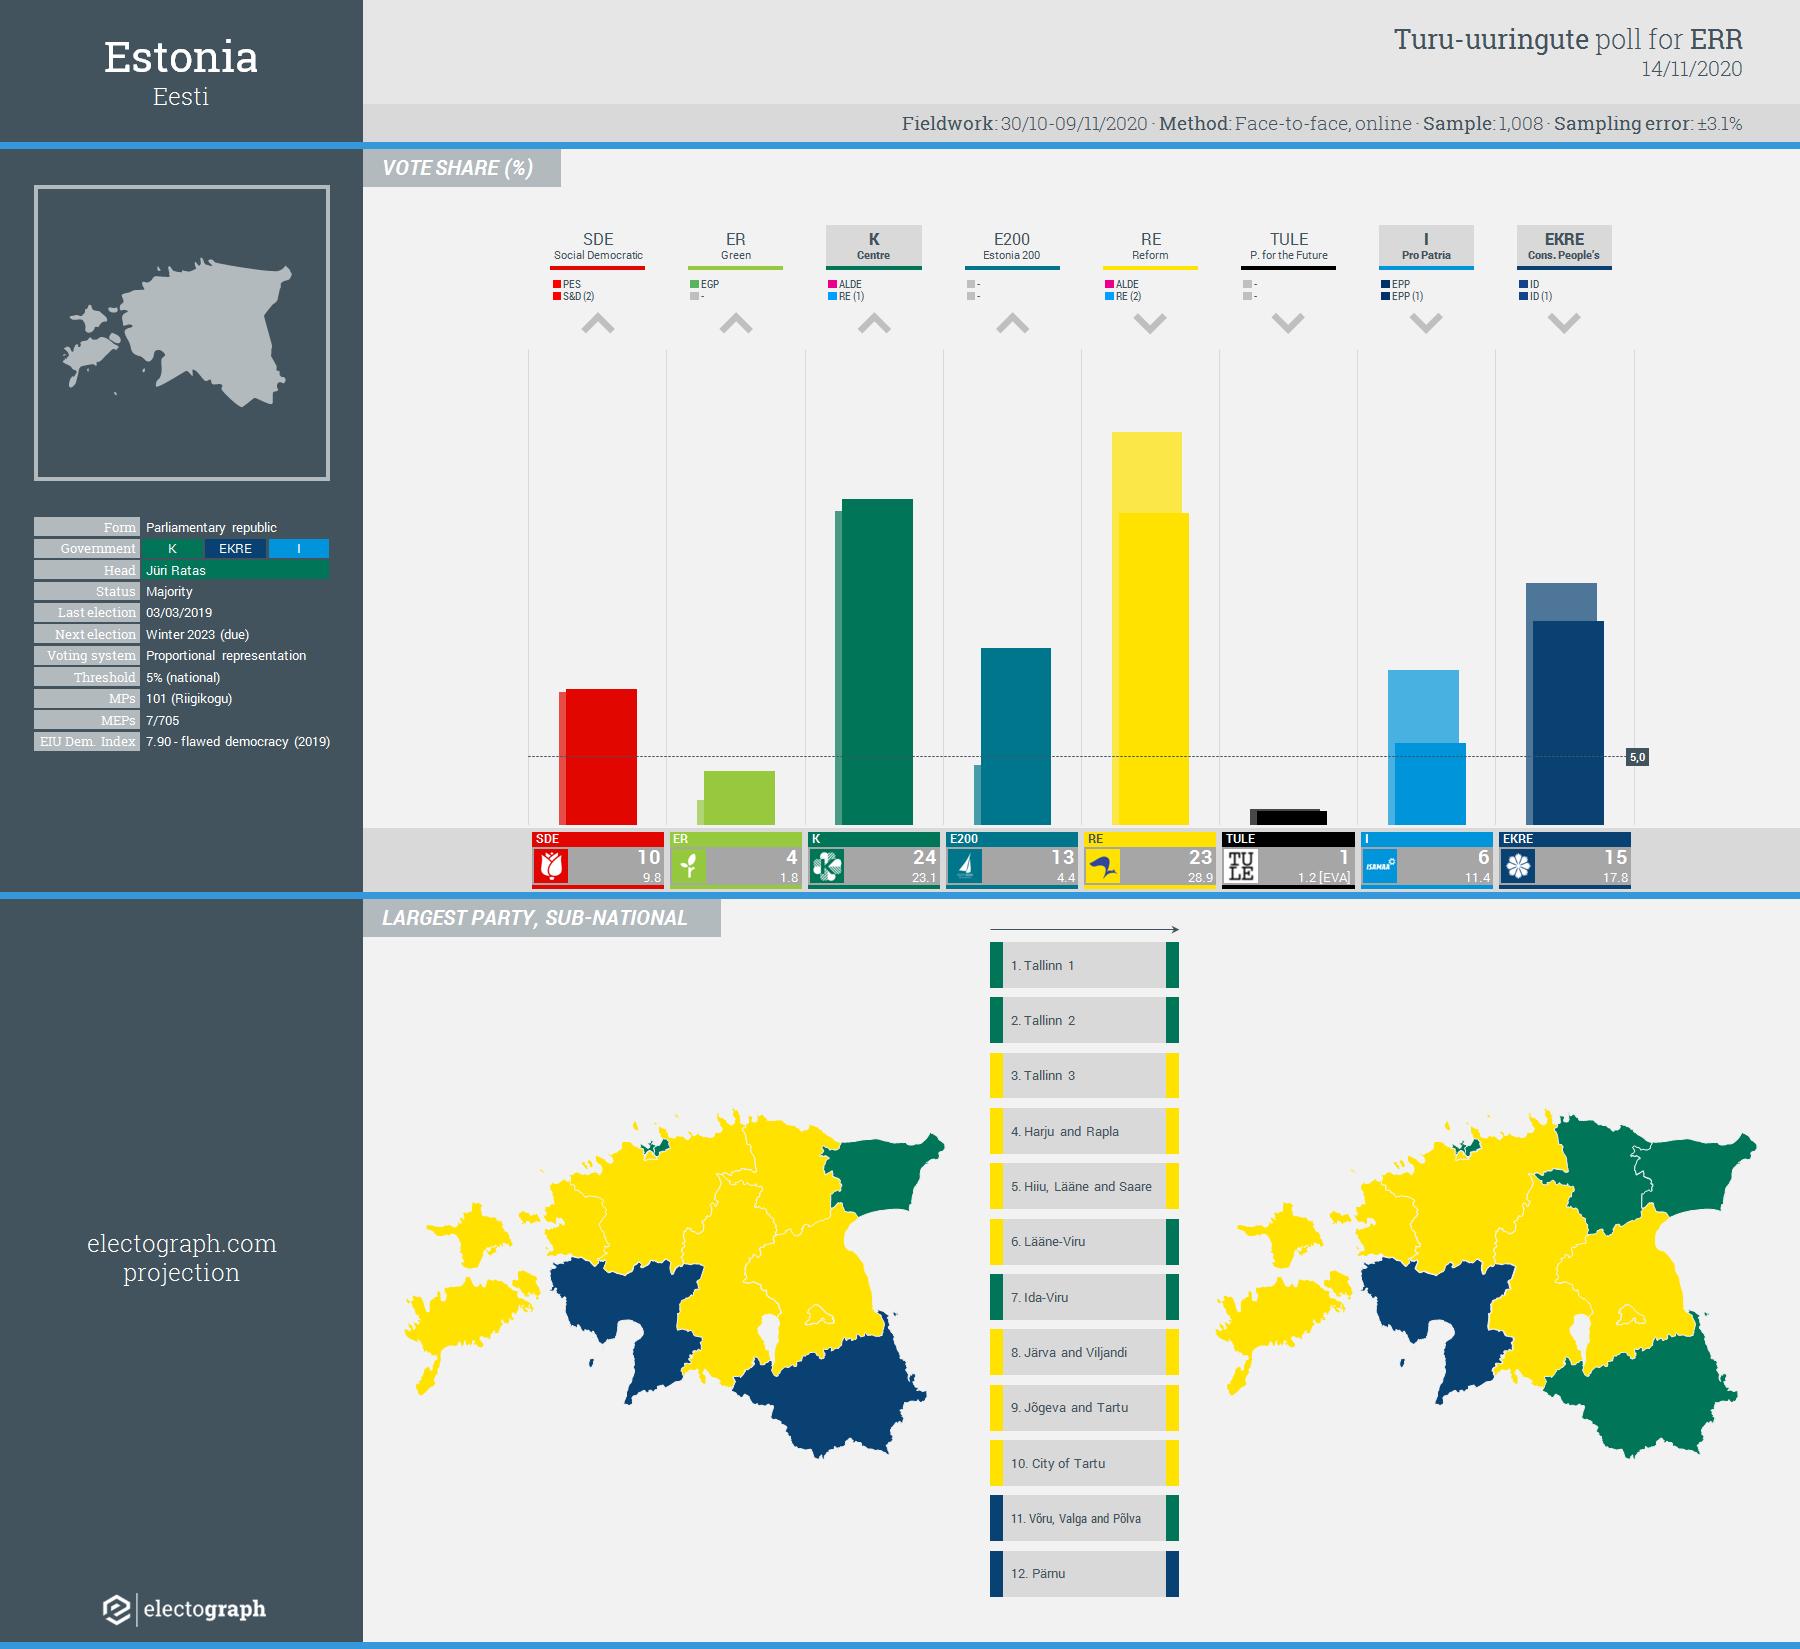 ESTONIA: Turu-uuringute poll chart for ERR, 14 November 2020